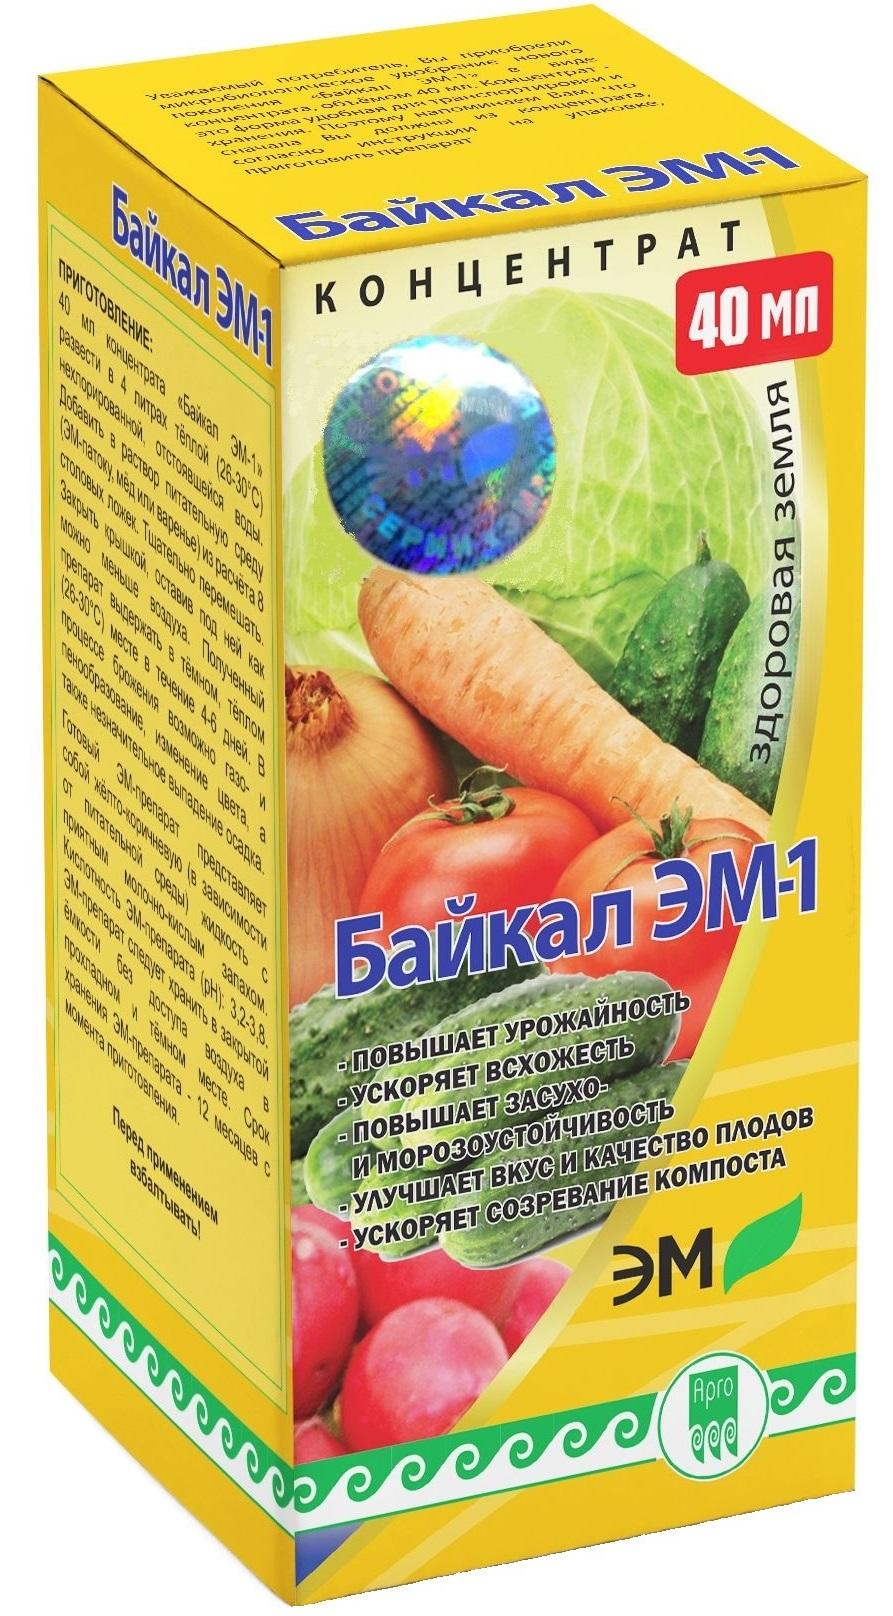 Биоудобрение Байкал ЭМ 1